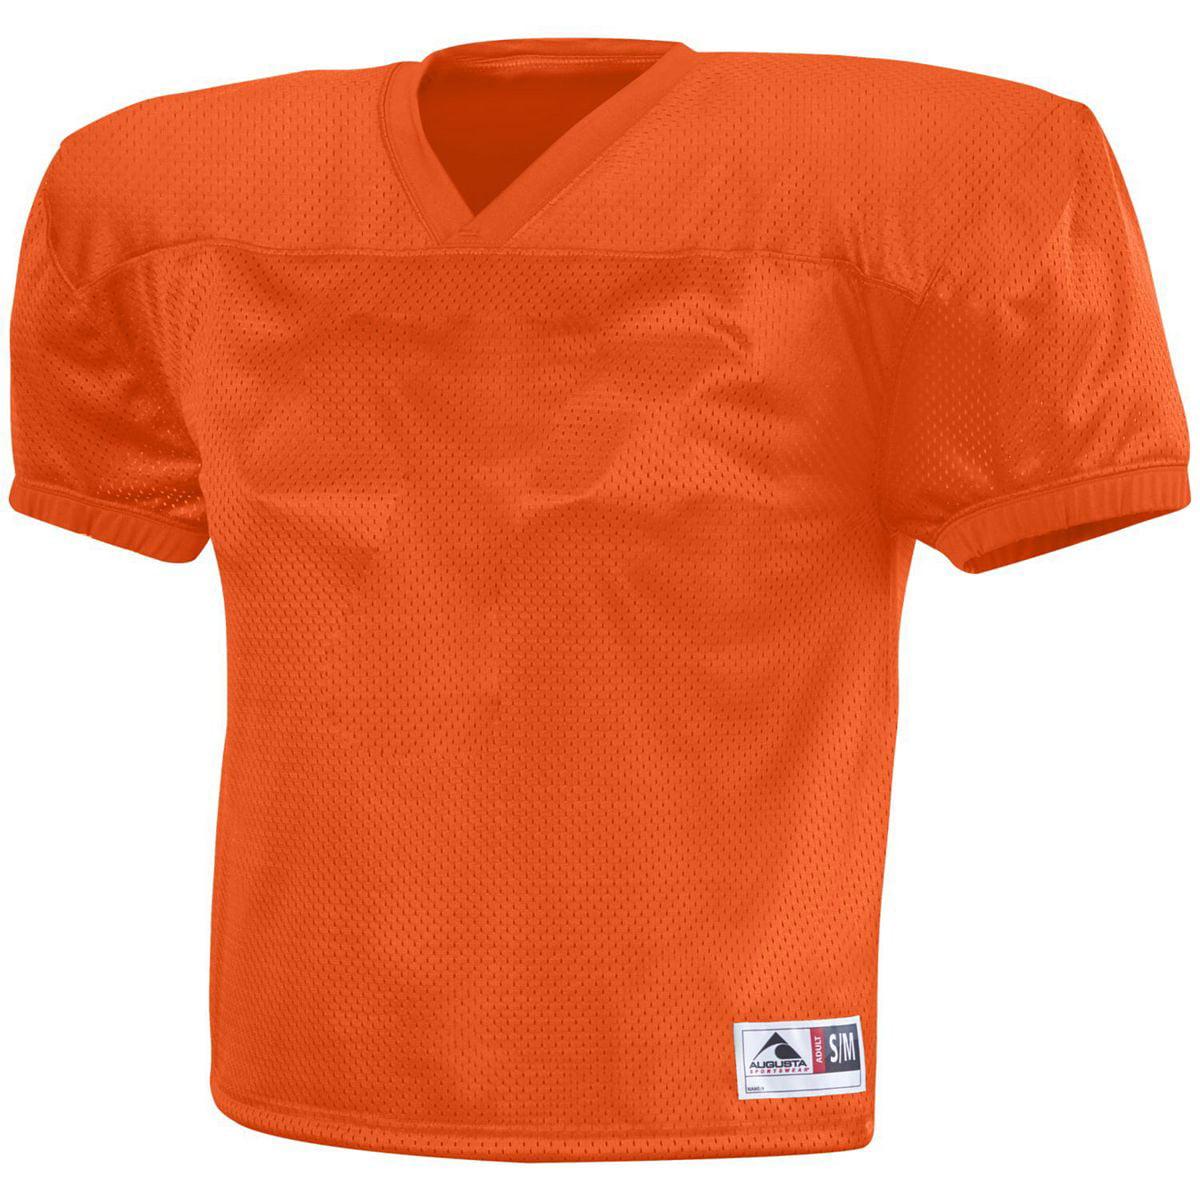 Augusta Youth Dash Practice Jersey Orange L/Xl - image 1 of 1